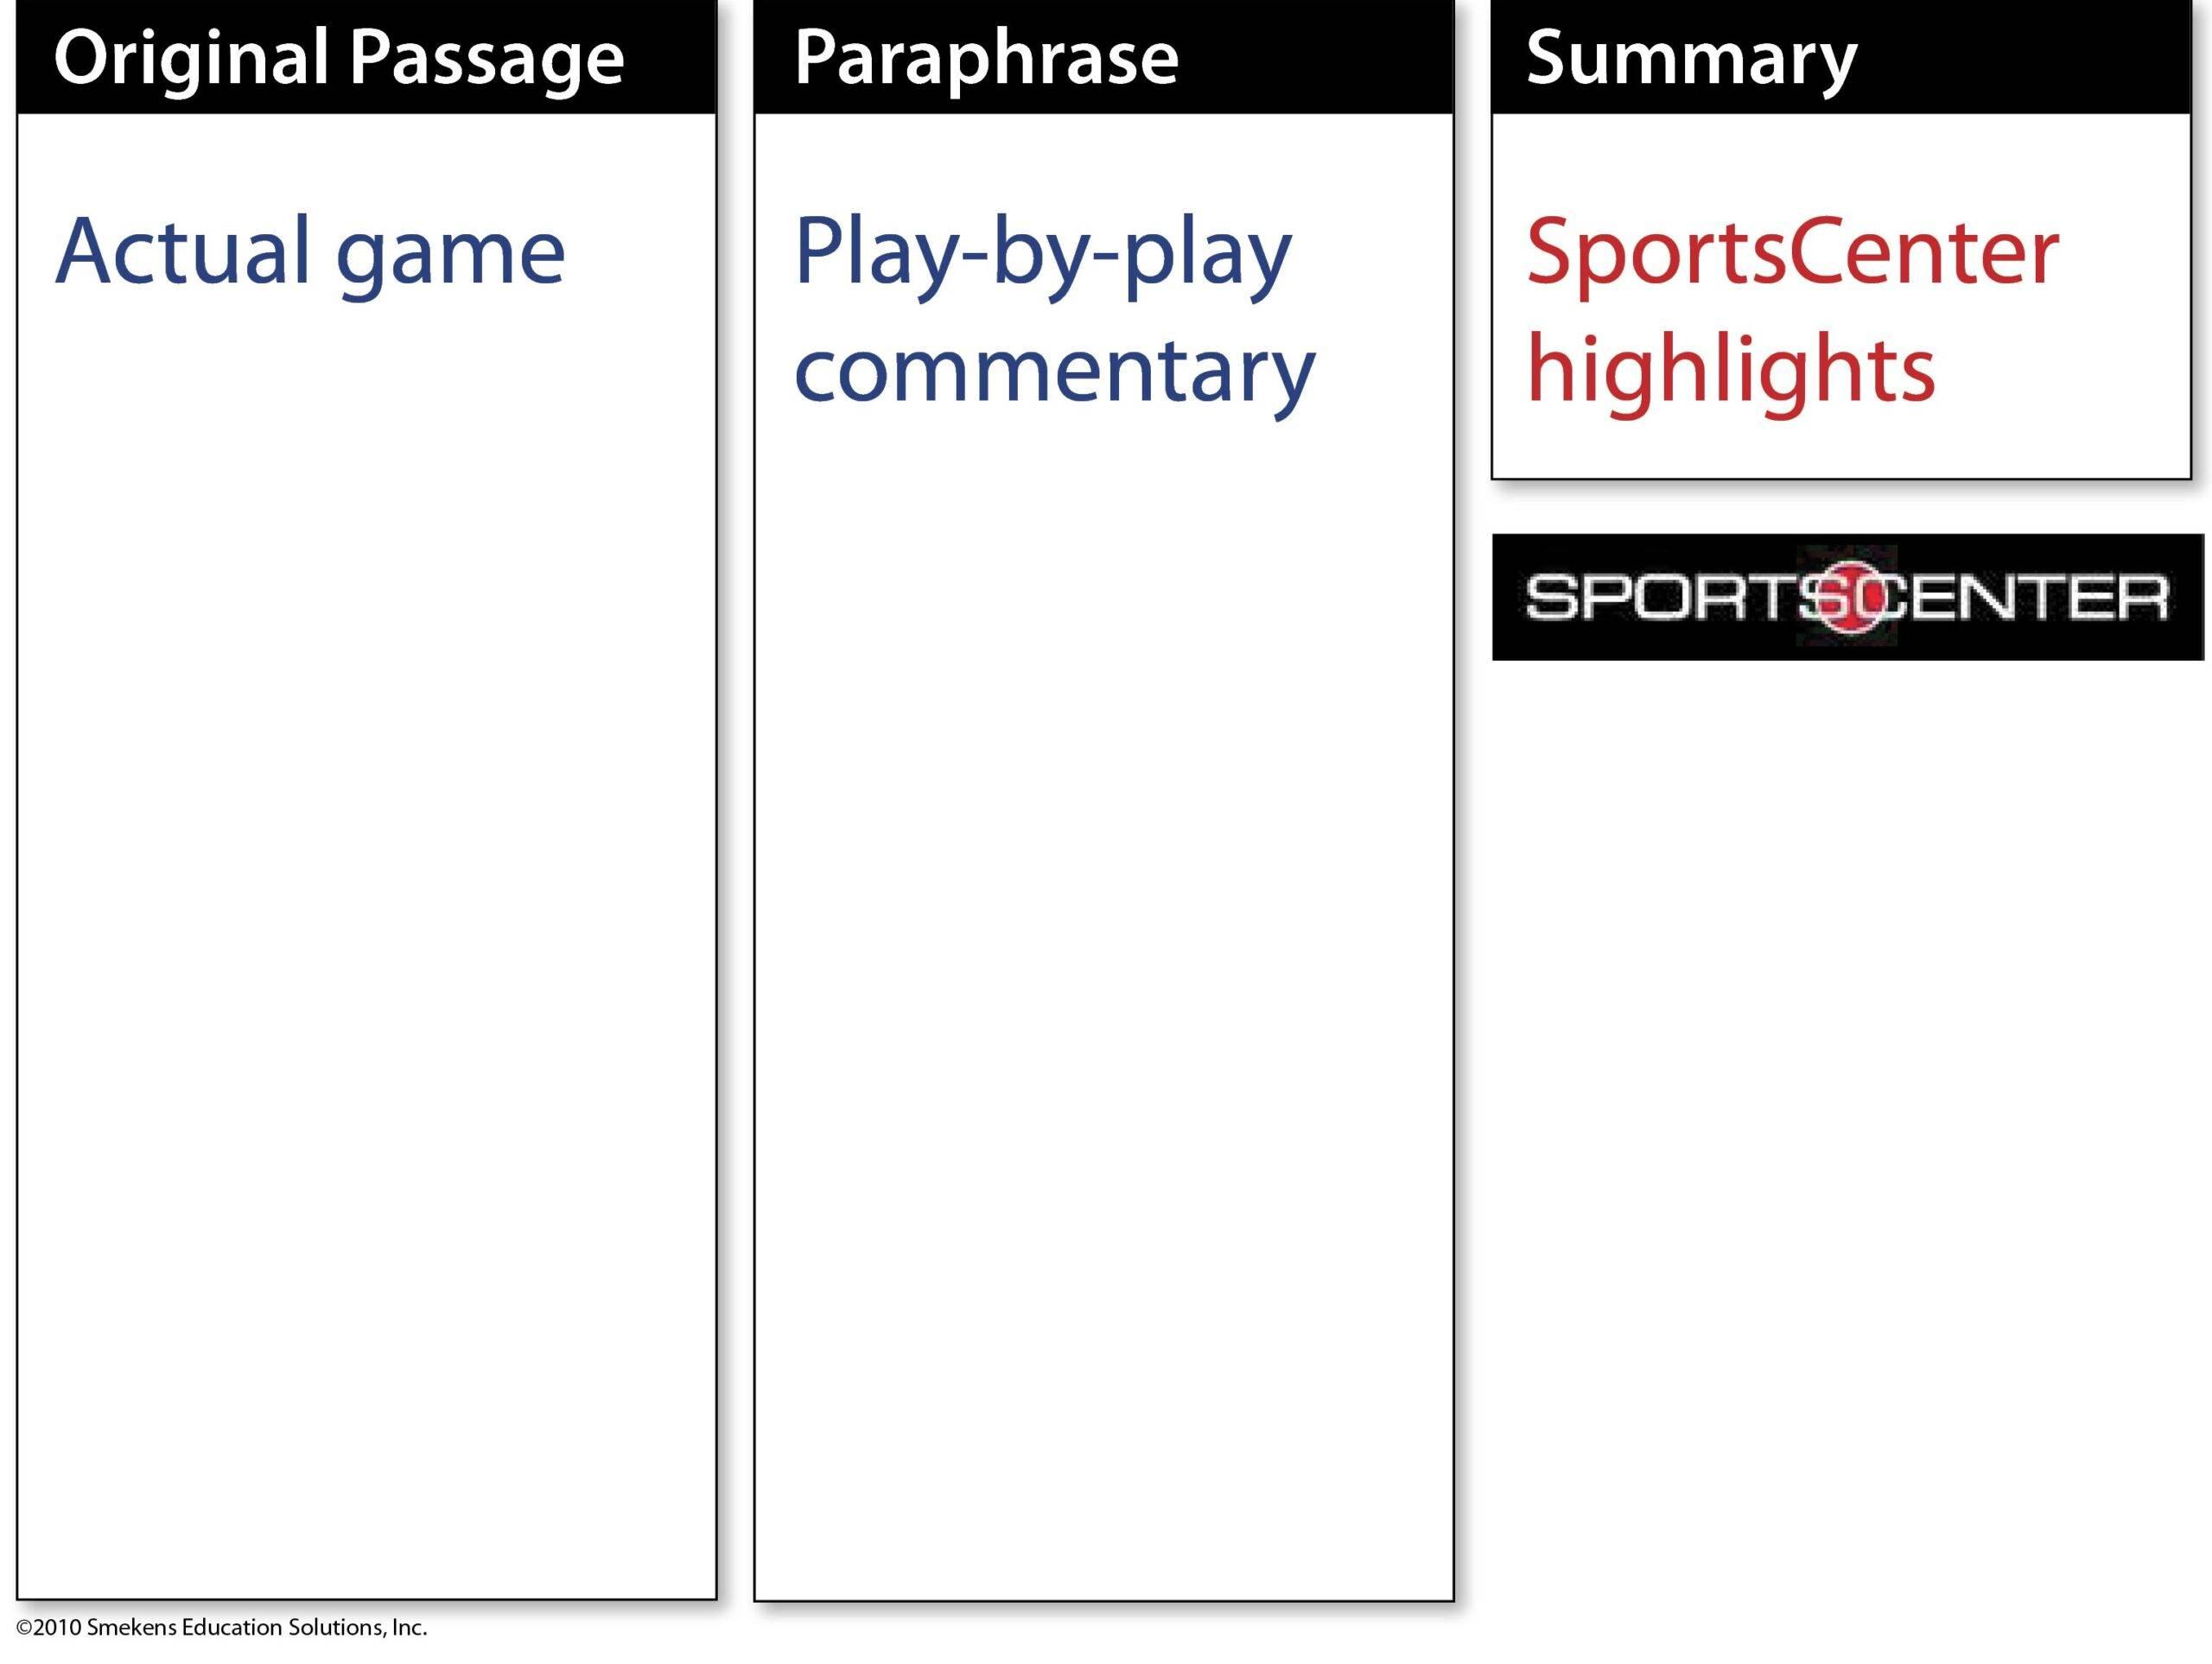 ESPN Original v Paraphrase v Summary